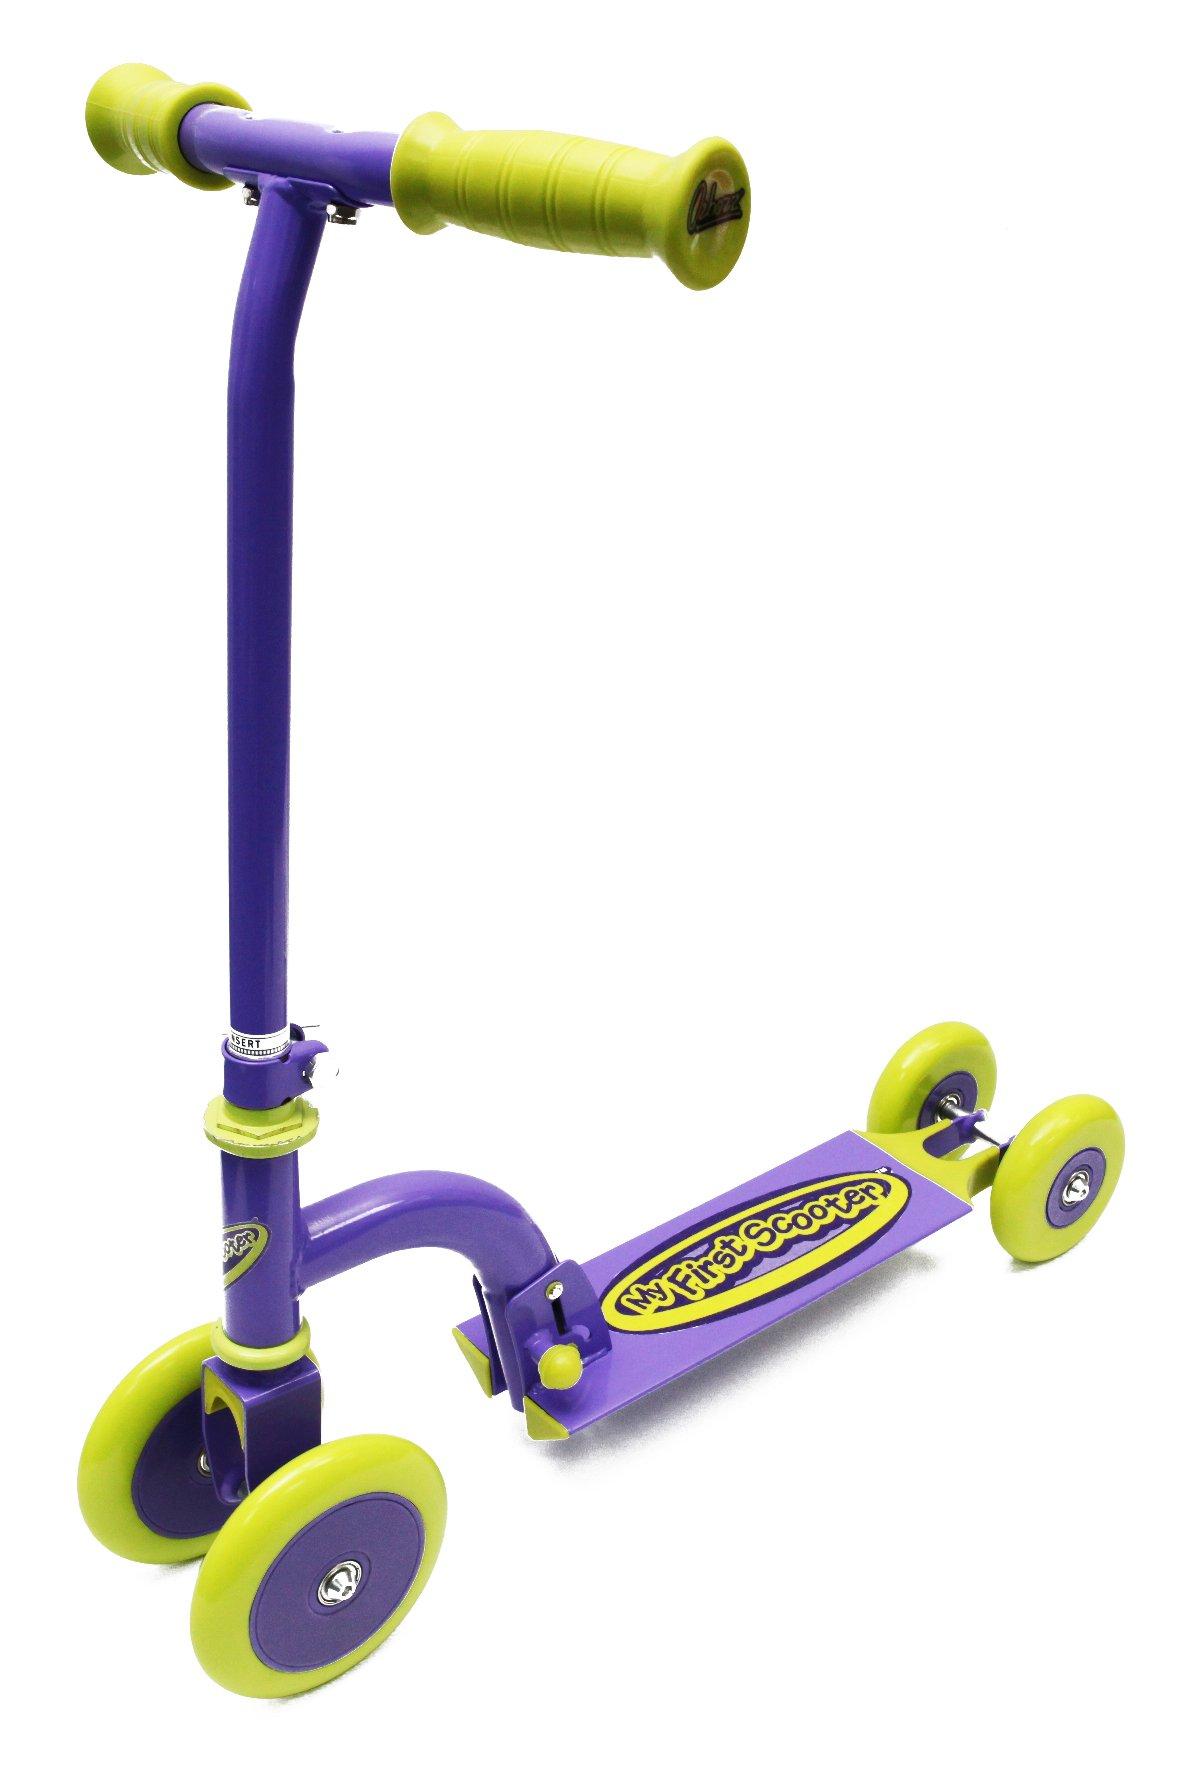 ozbozz my first scooter instructions